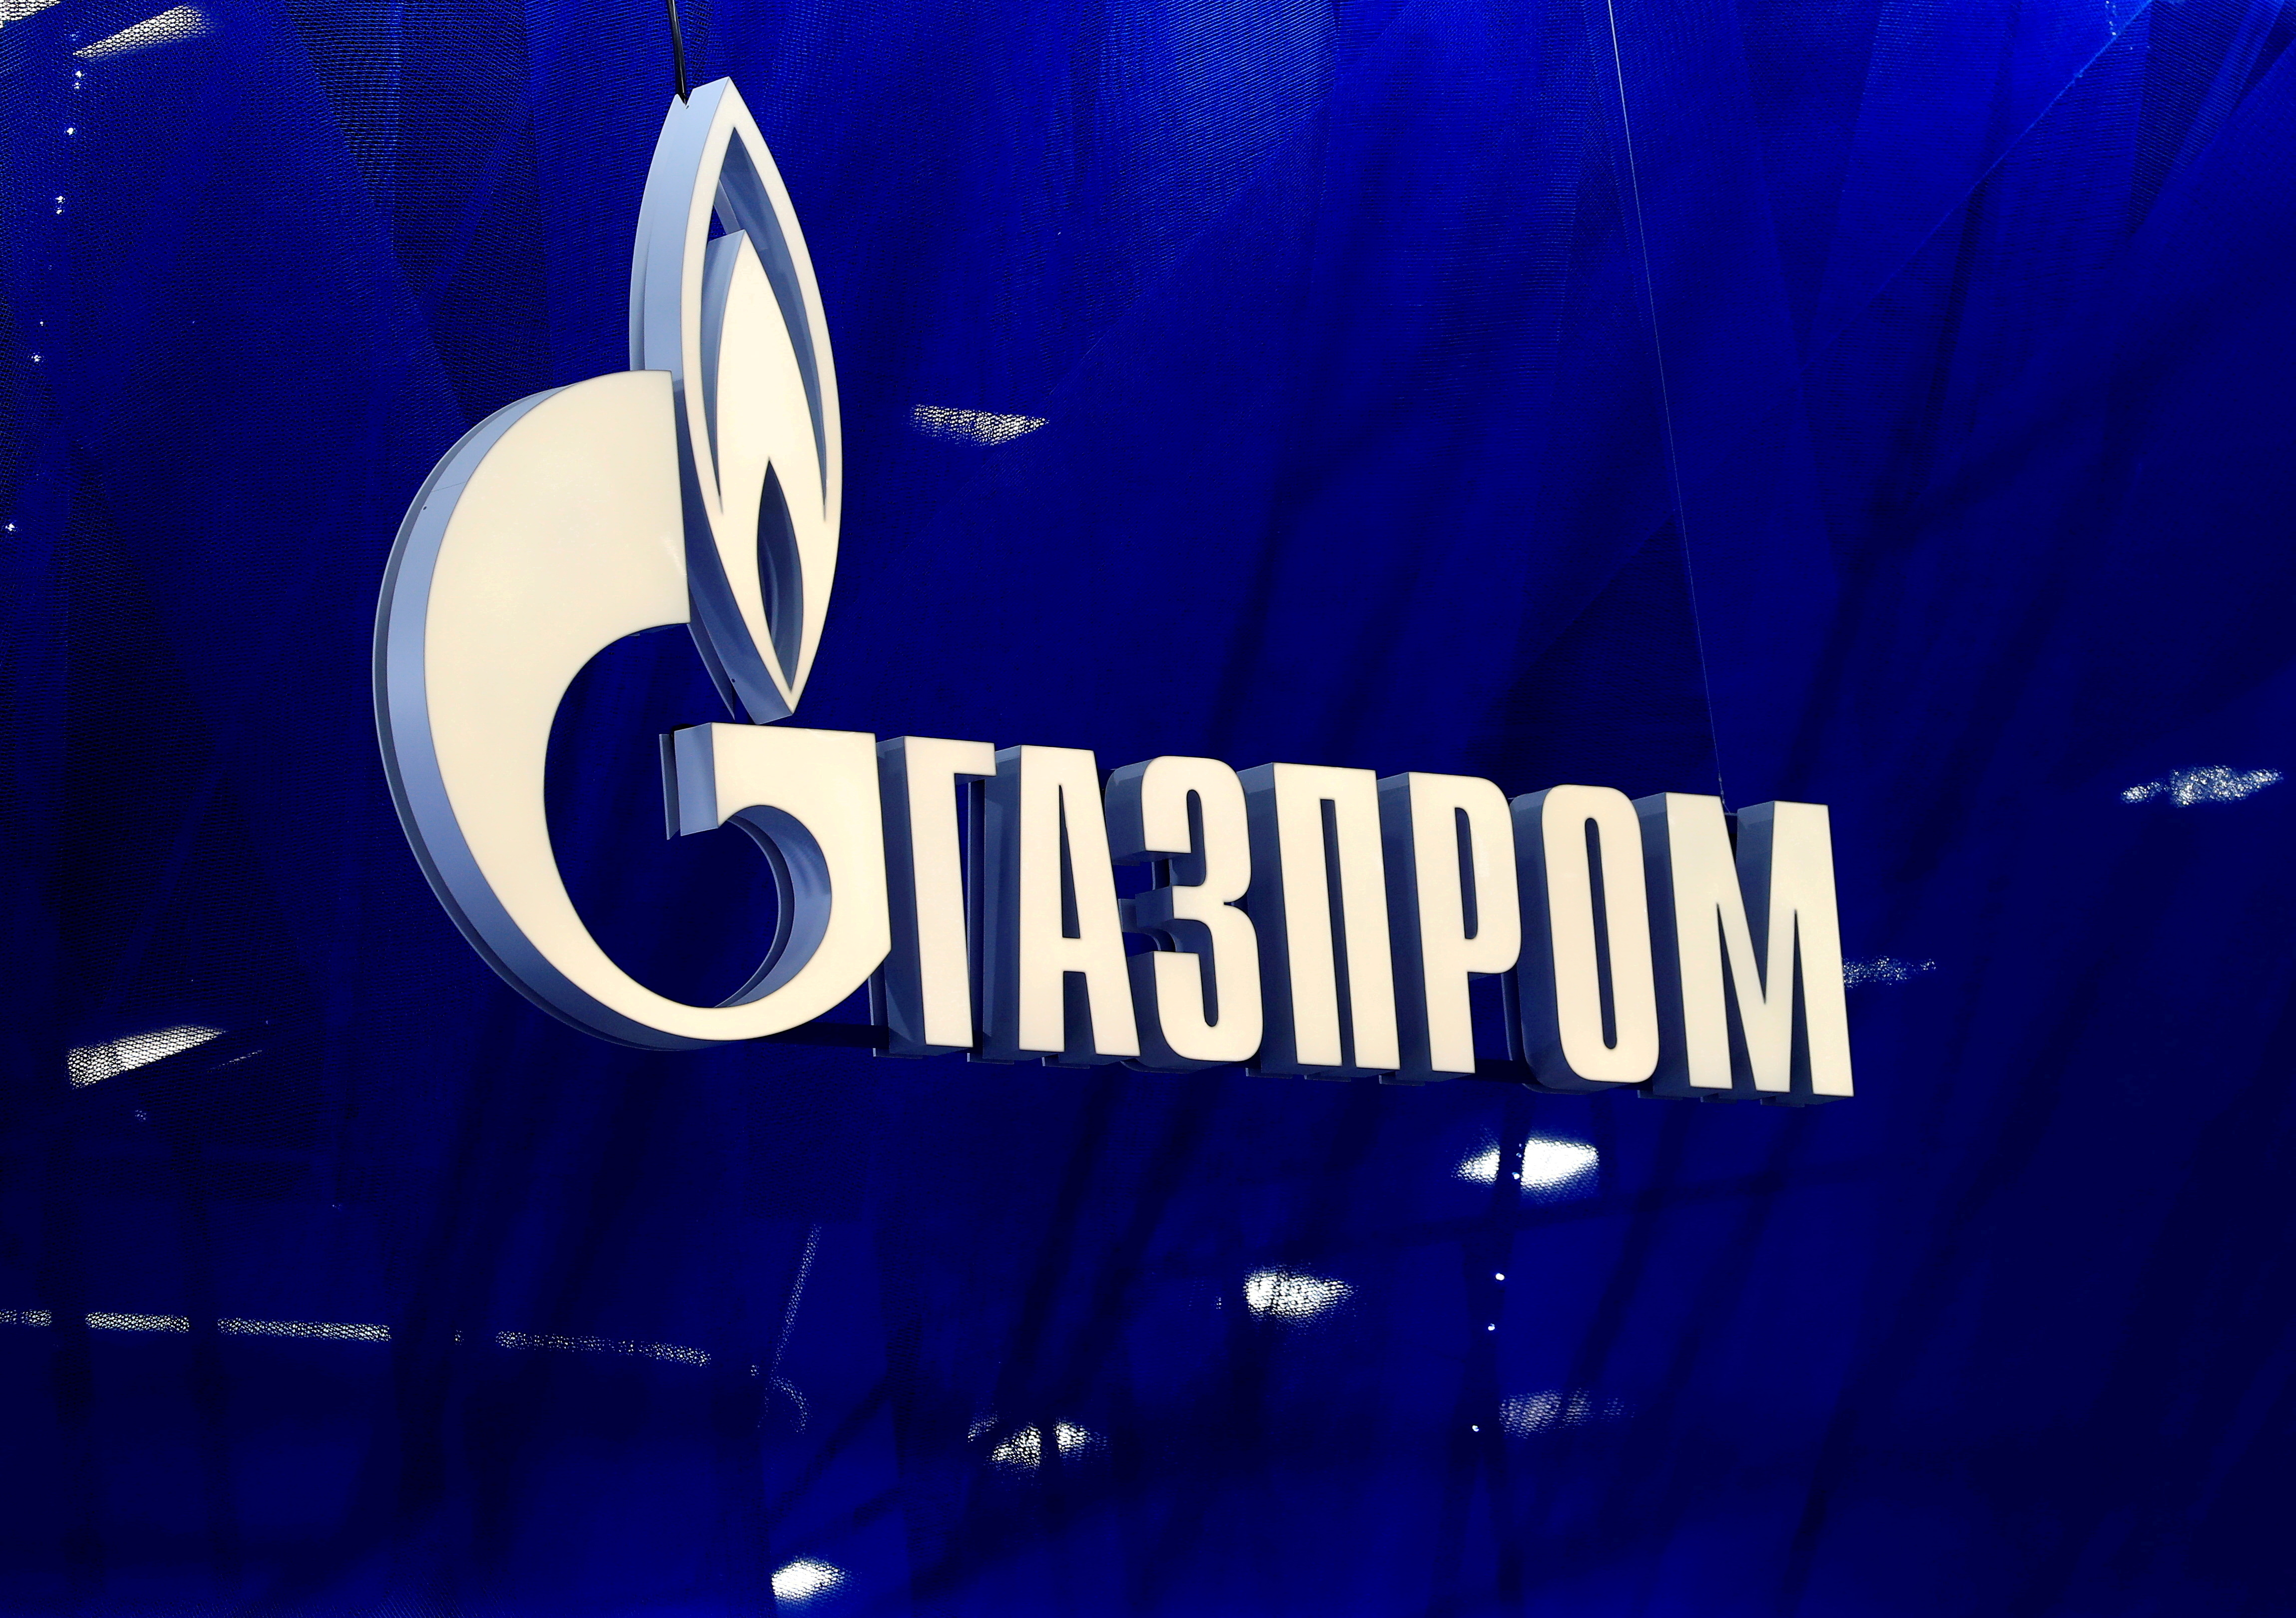 The logo of Gazprom company is seen at the St. Petersburg International Economic Forum (SPIEF) in Saint Petersburg, Russia, June 2, 2021. REUTERS/Evgenia Novozhenina/File Photo